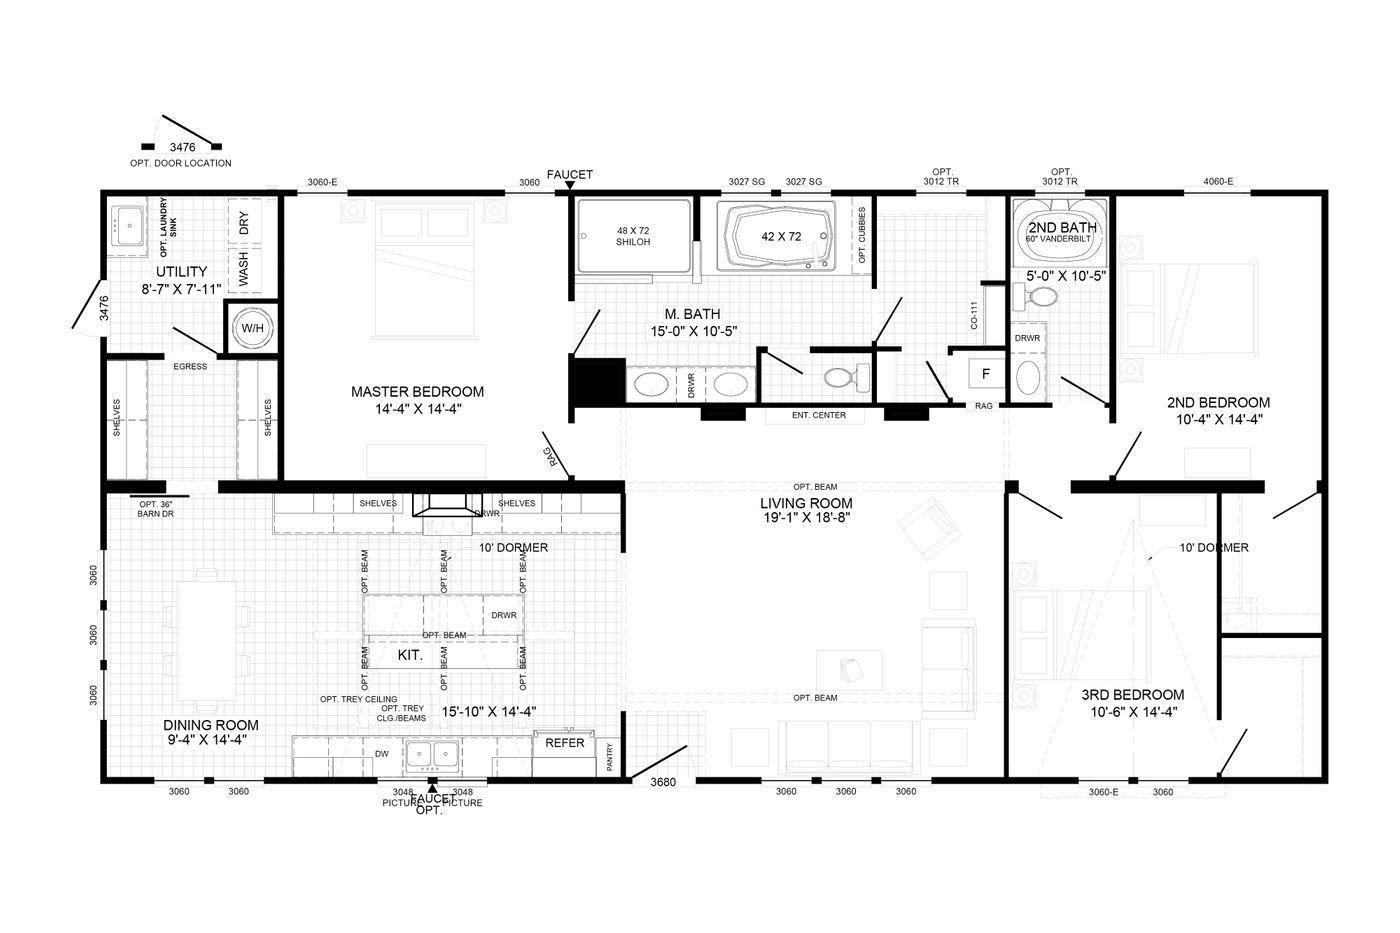 The Liza Jane Floorplan